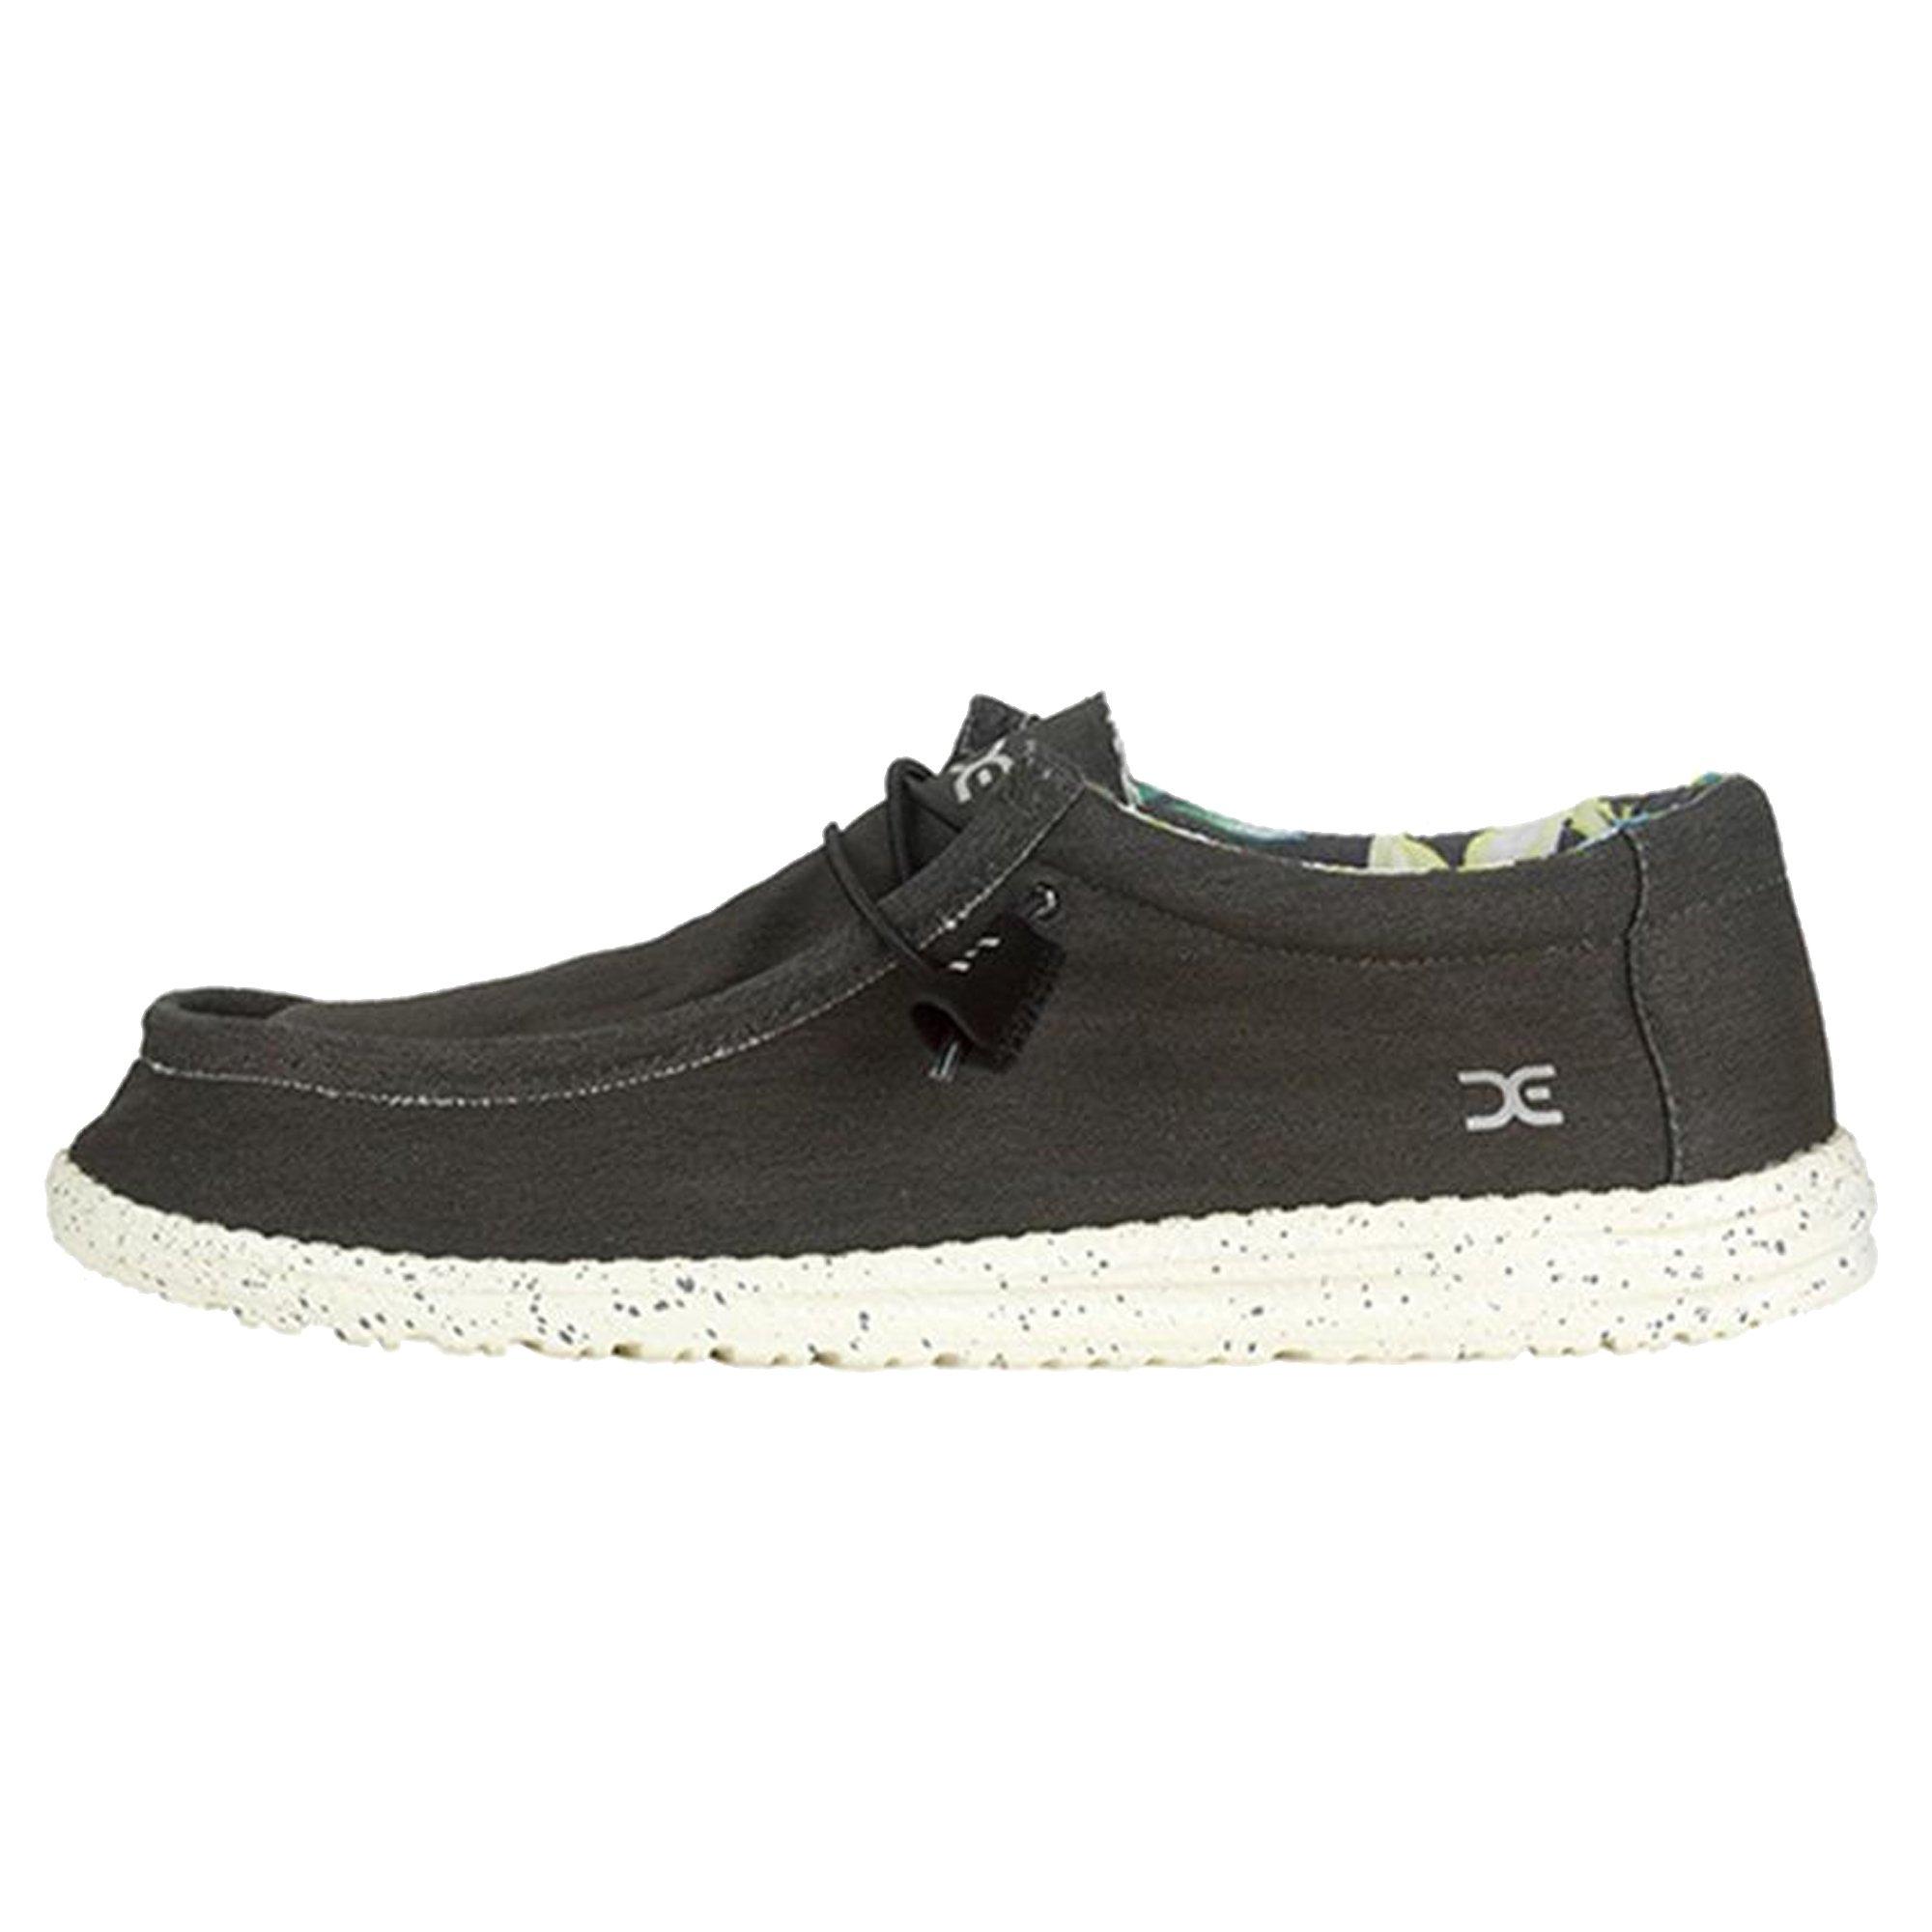 Hey Dude Men's Wally Stretch Loafers, Black, Textile, Memory Foam, 10 US M/EU 43